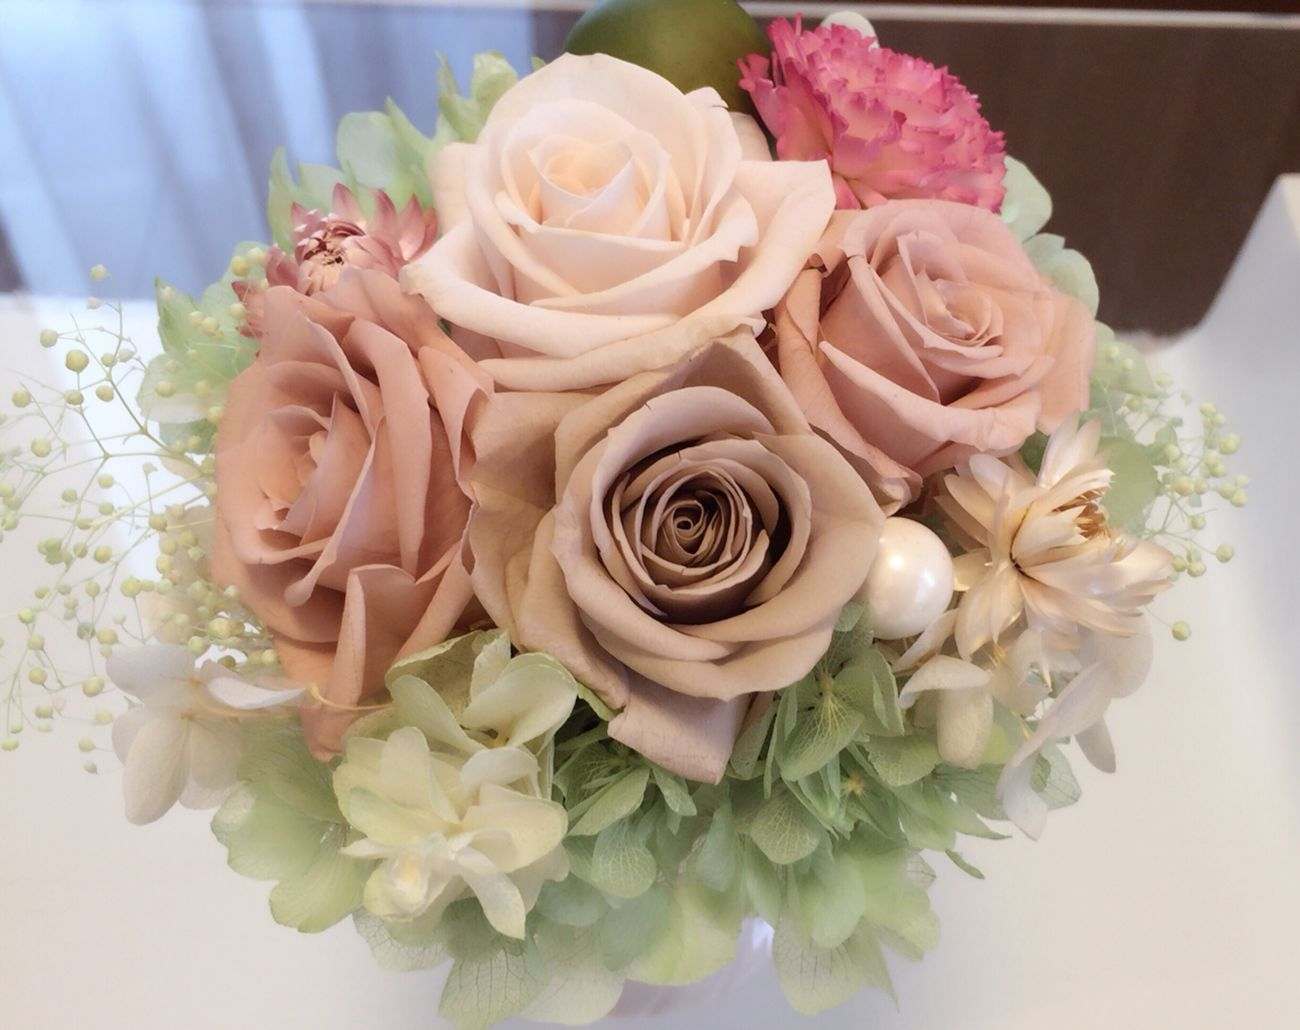 Flower Flower Arrangement ブリザードフラワー ピンク 趣味 手作り 趣味